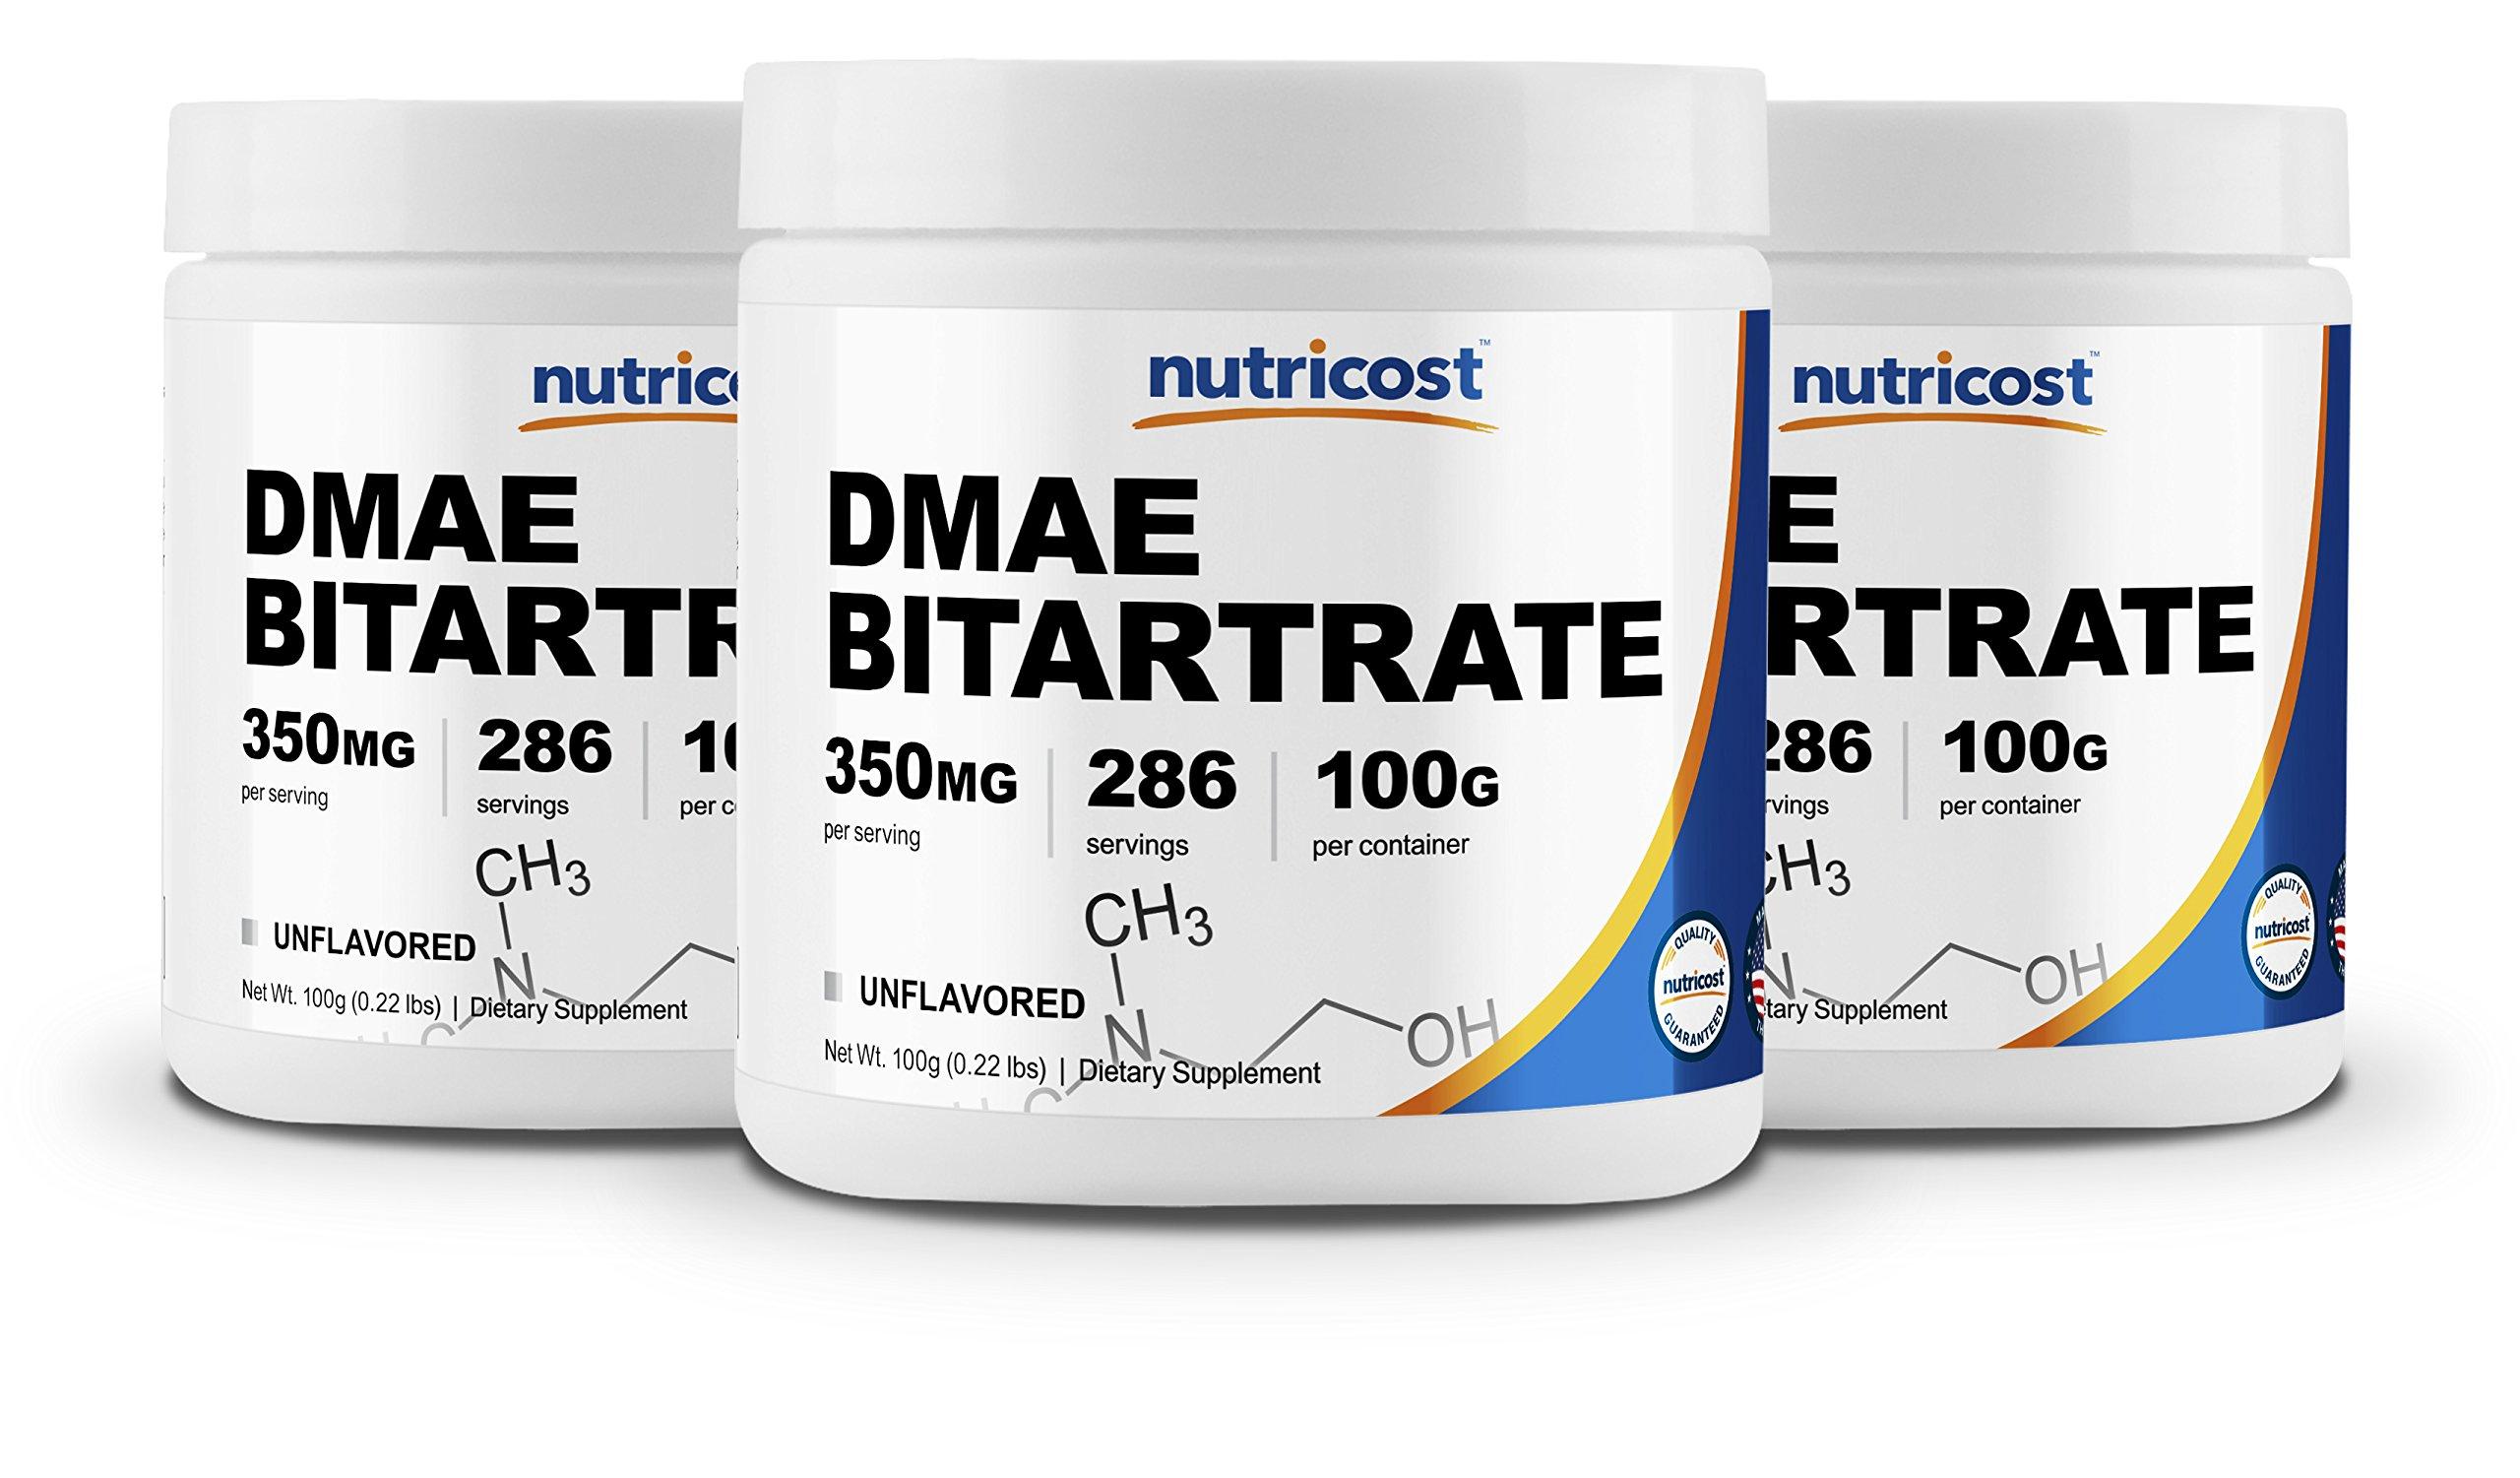 Nutricost Pure DMAE-Bitartrate Powder 100G (3 Bottles)